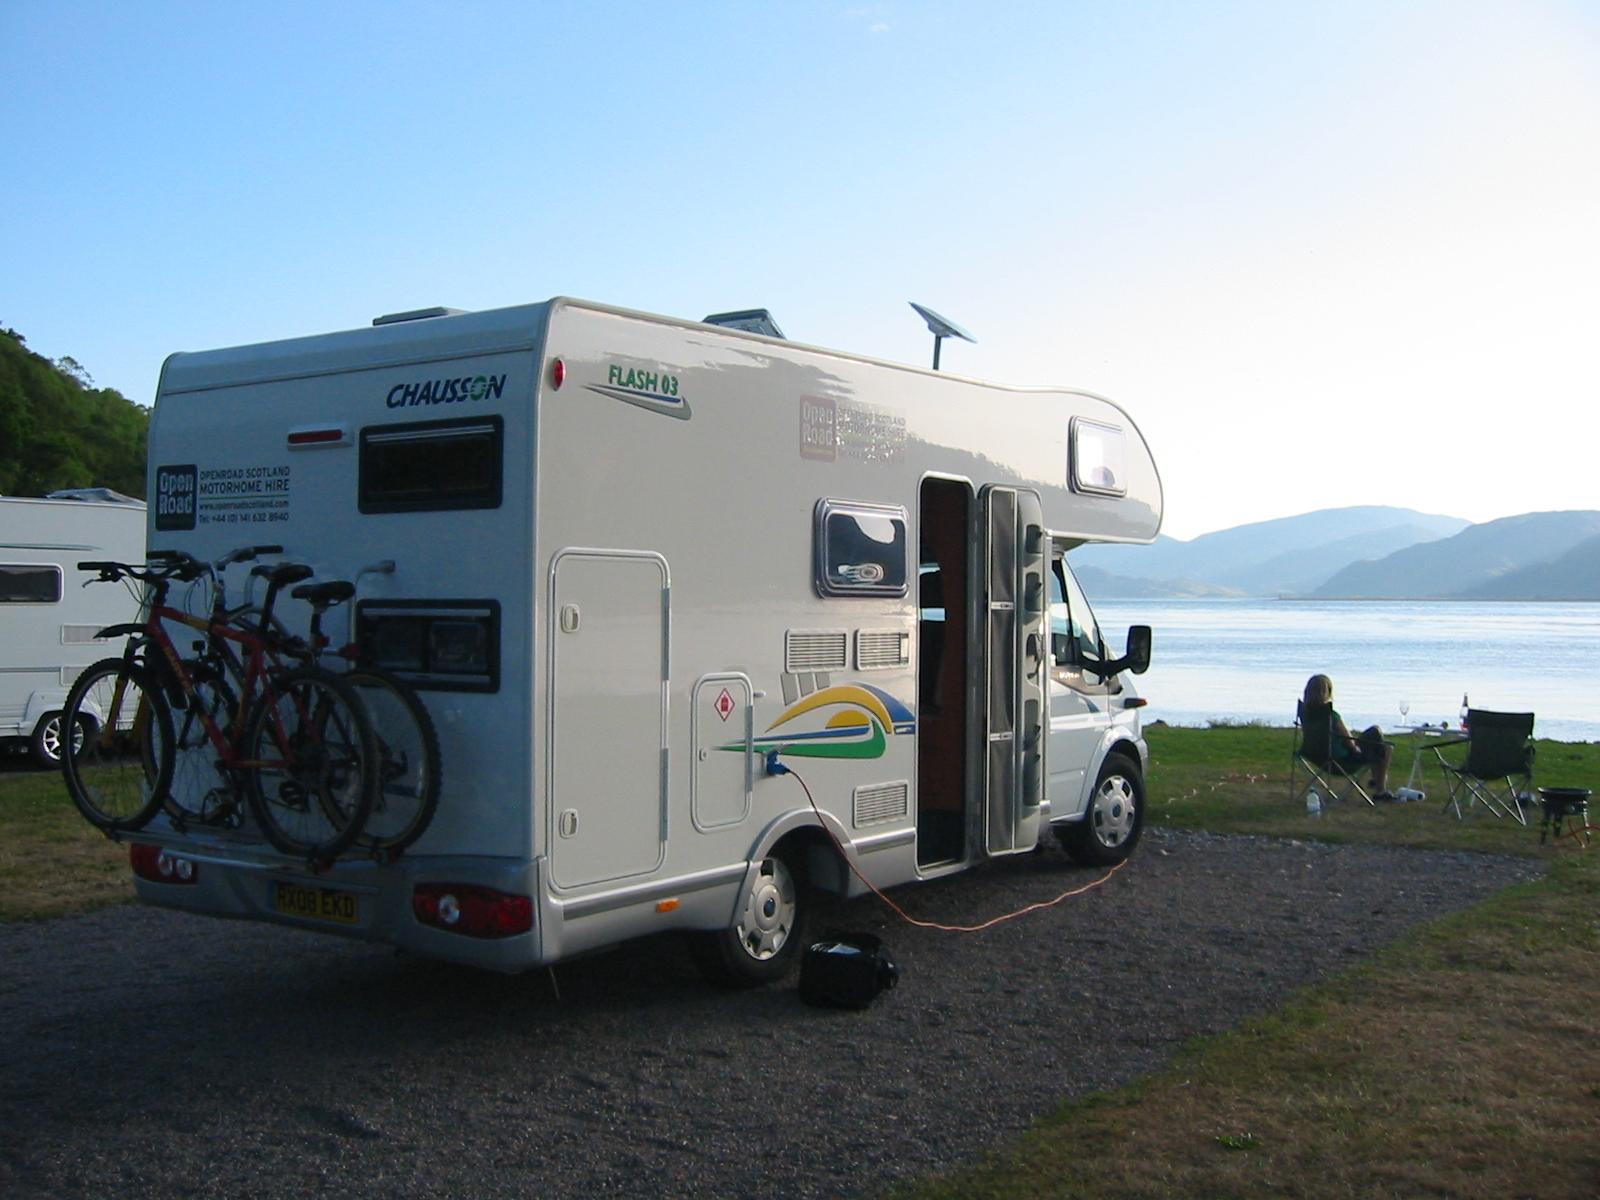 Lastest Motorhome Rental Scotland  Scottish Tourer Motorhome Blog